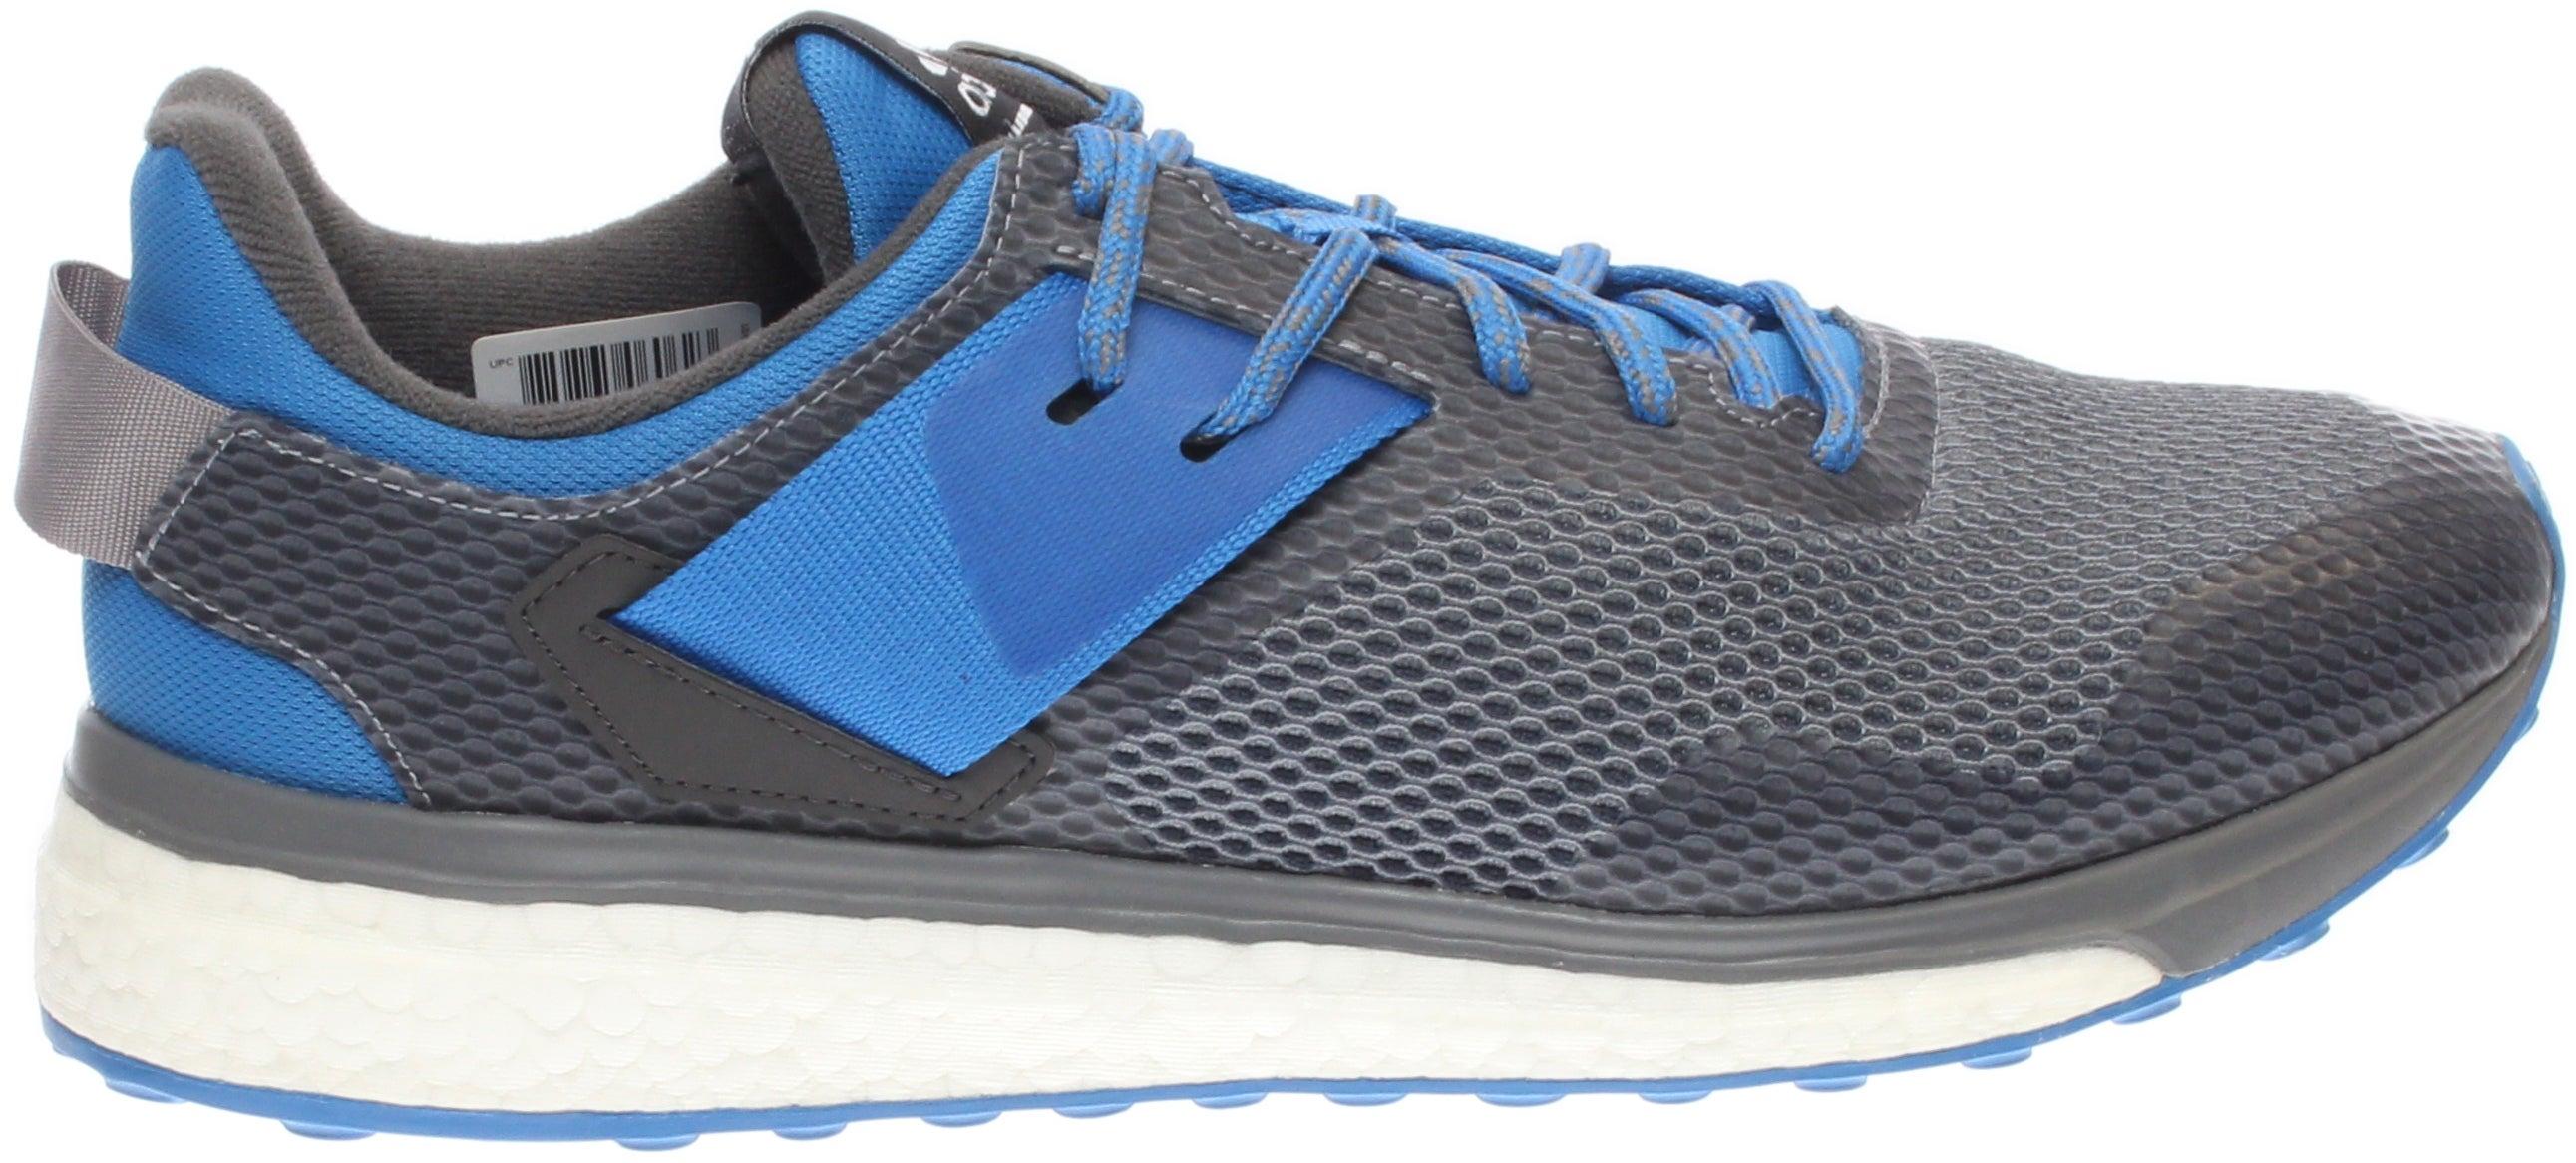 adidas Response 3 m Grey - Mens  - Size 6.5